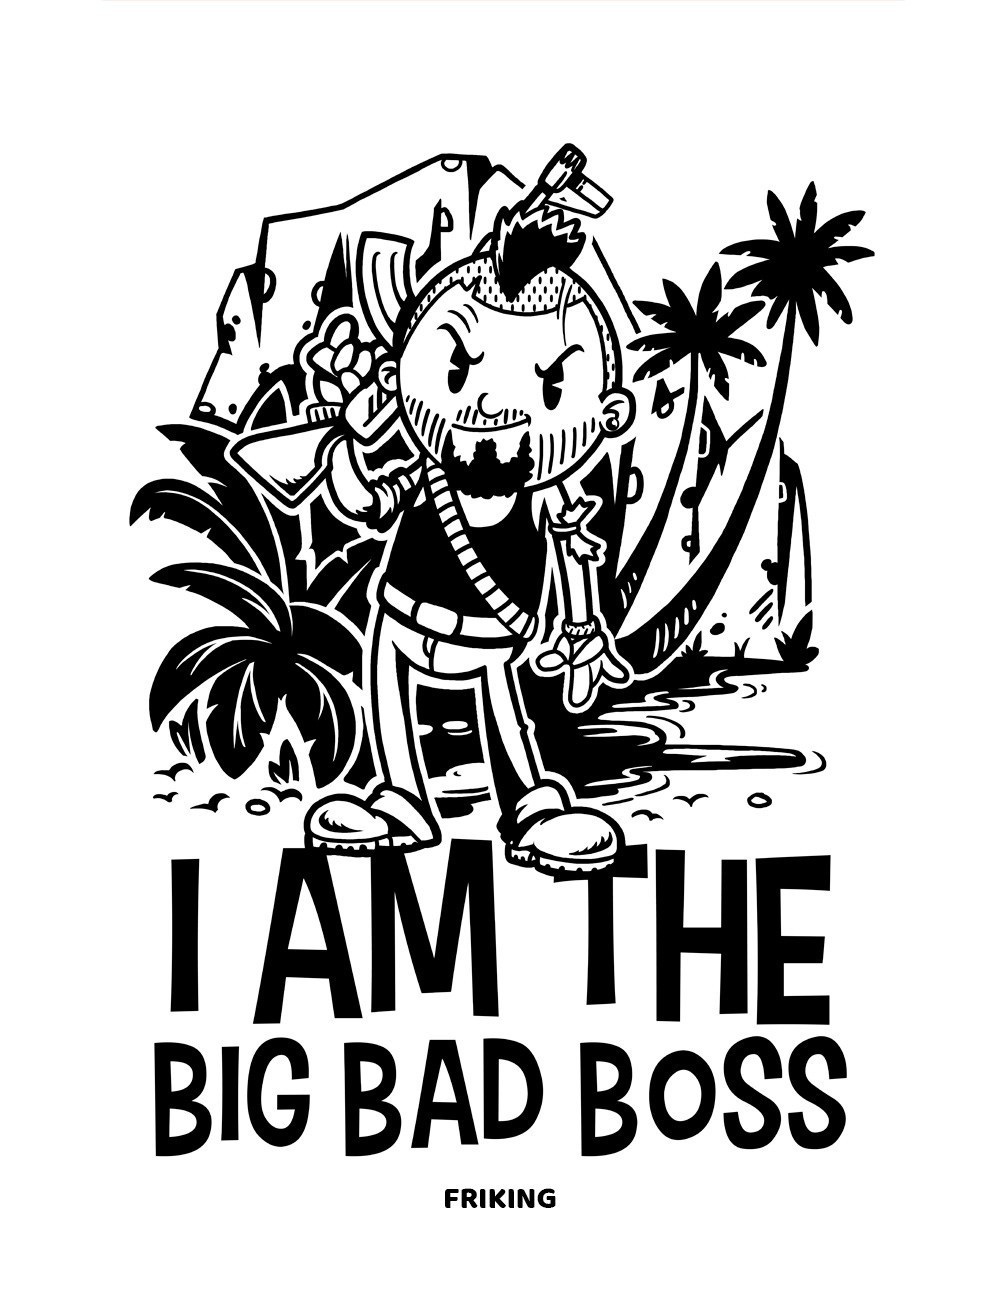 Big Bad Boss